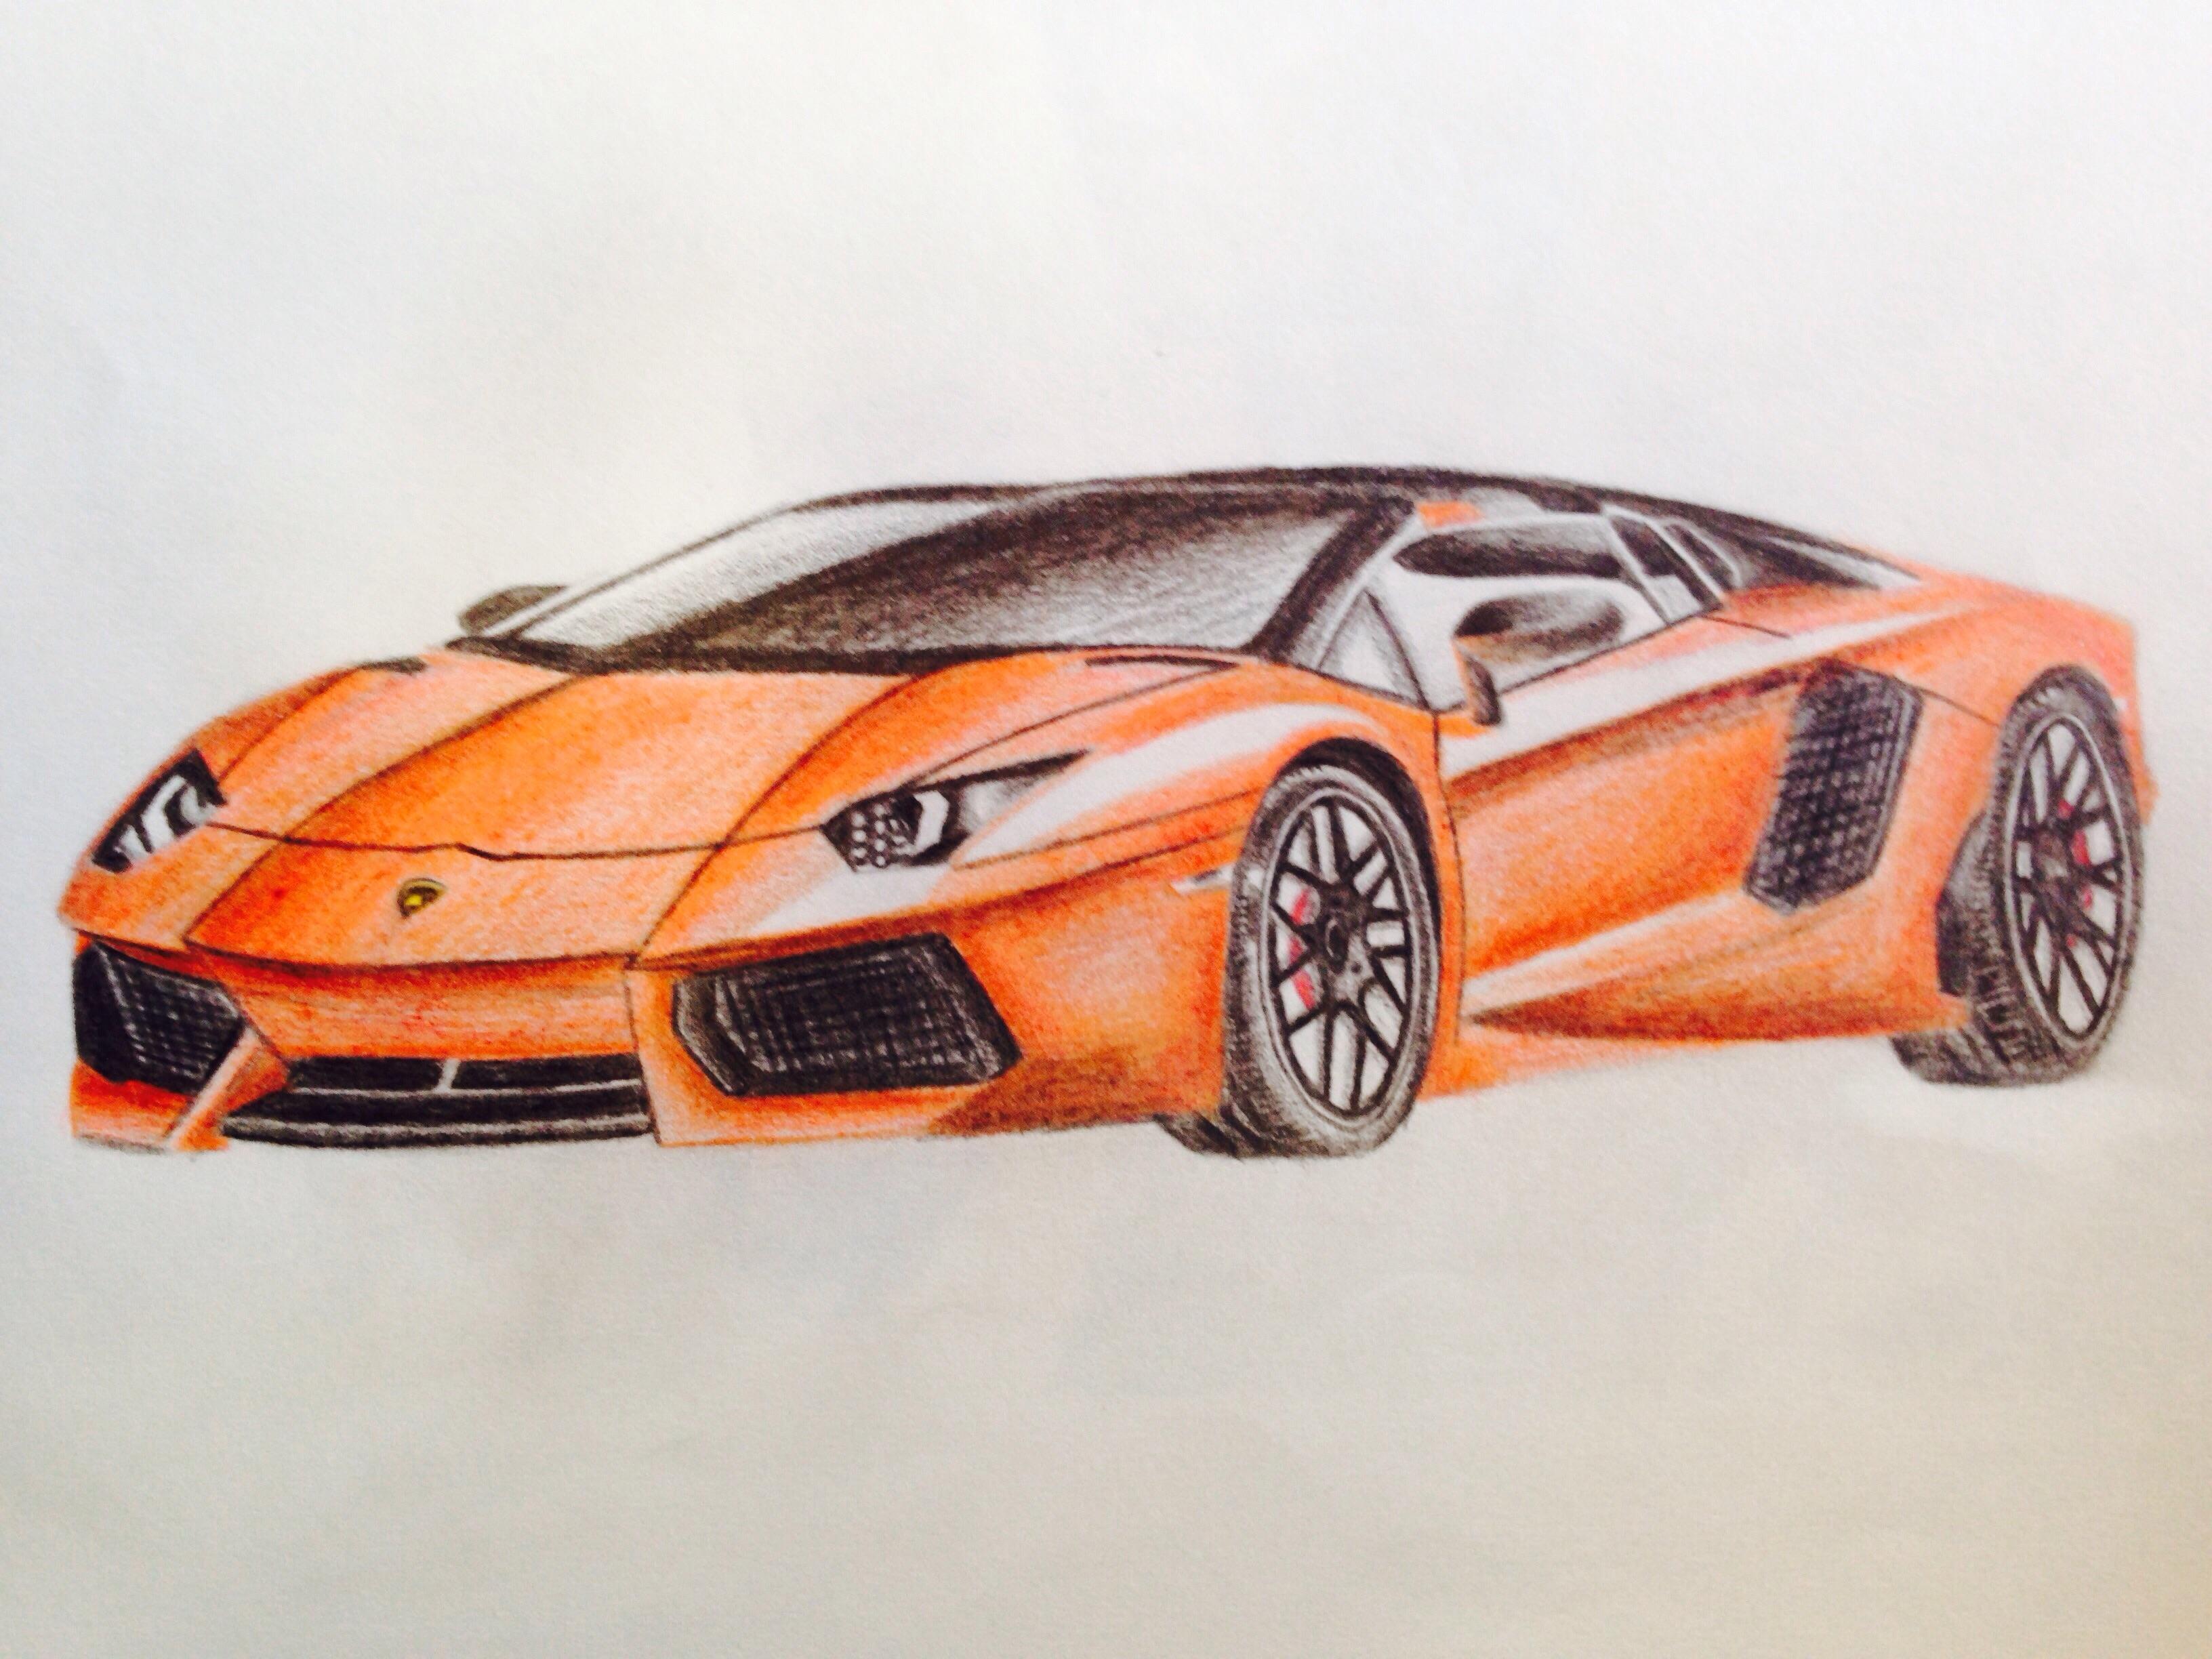 3264x2448 A4 Lamborghini Car Drawing Patelmanu7 Foundmyself